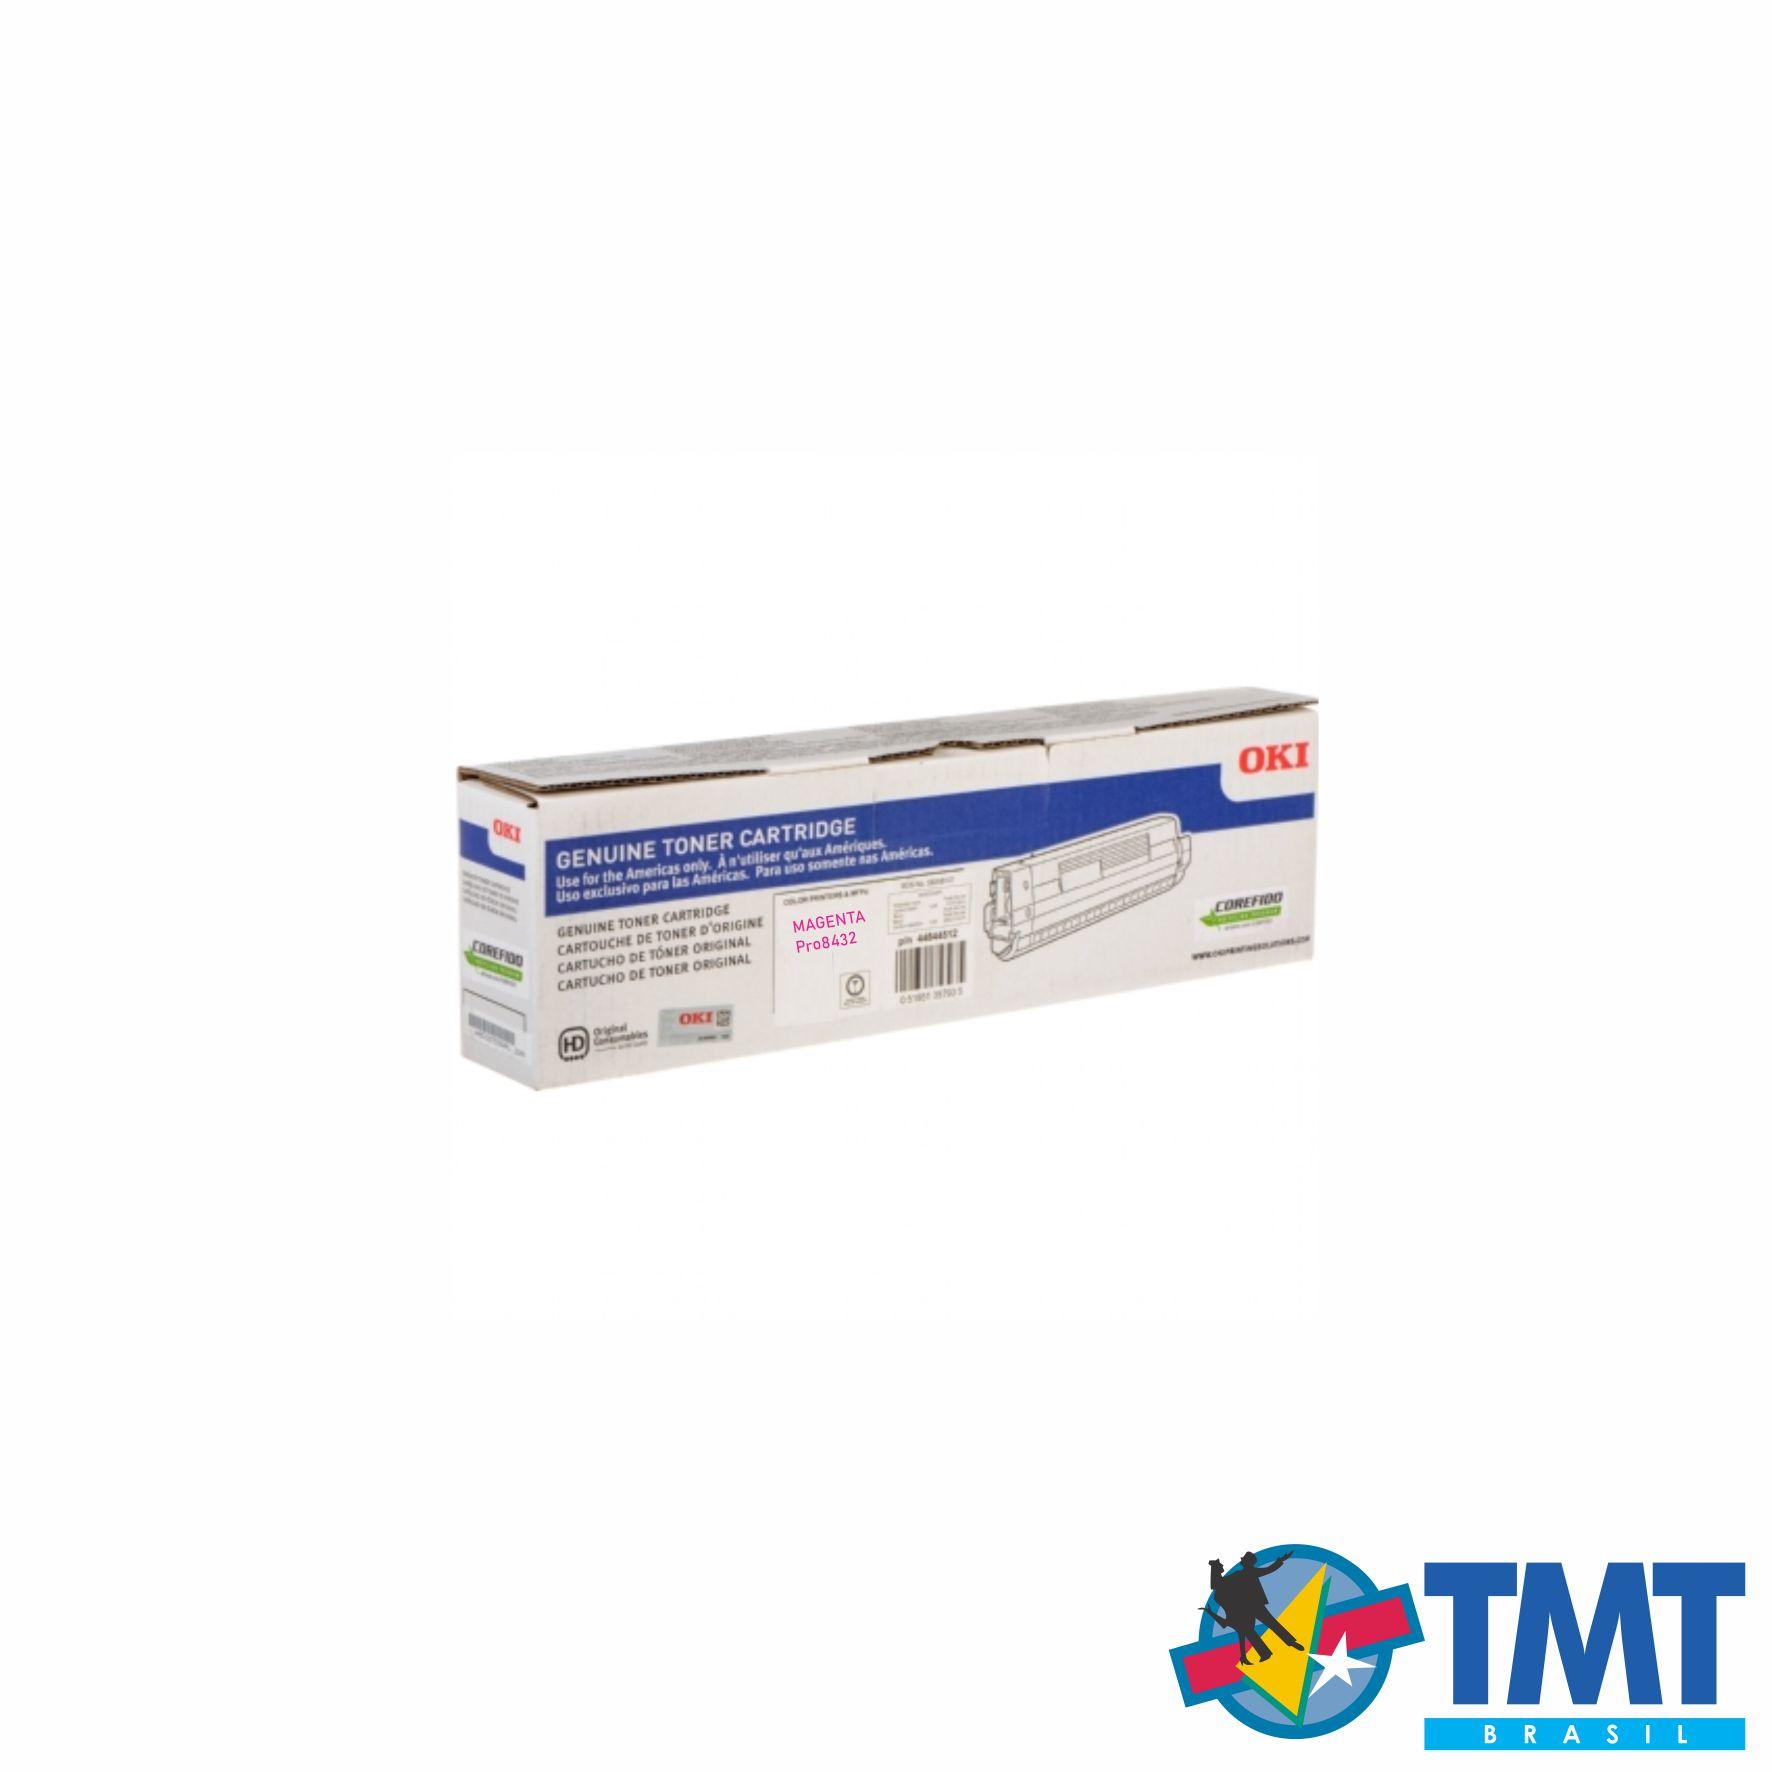 Cartucho de Toner Magenta OKI PRO8432 - Alta Capacidade